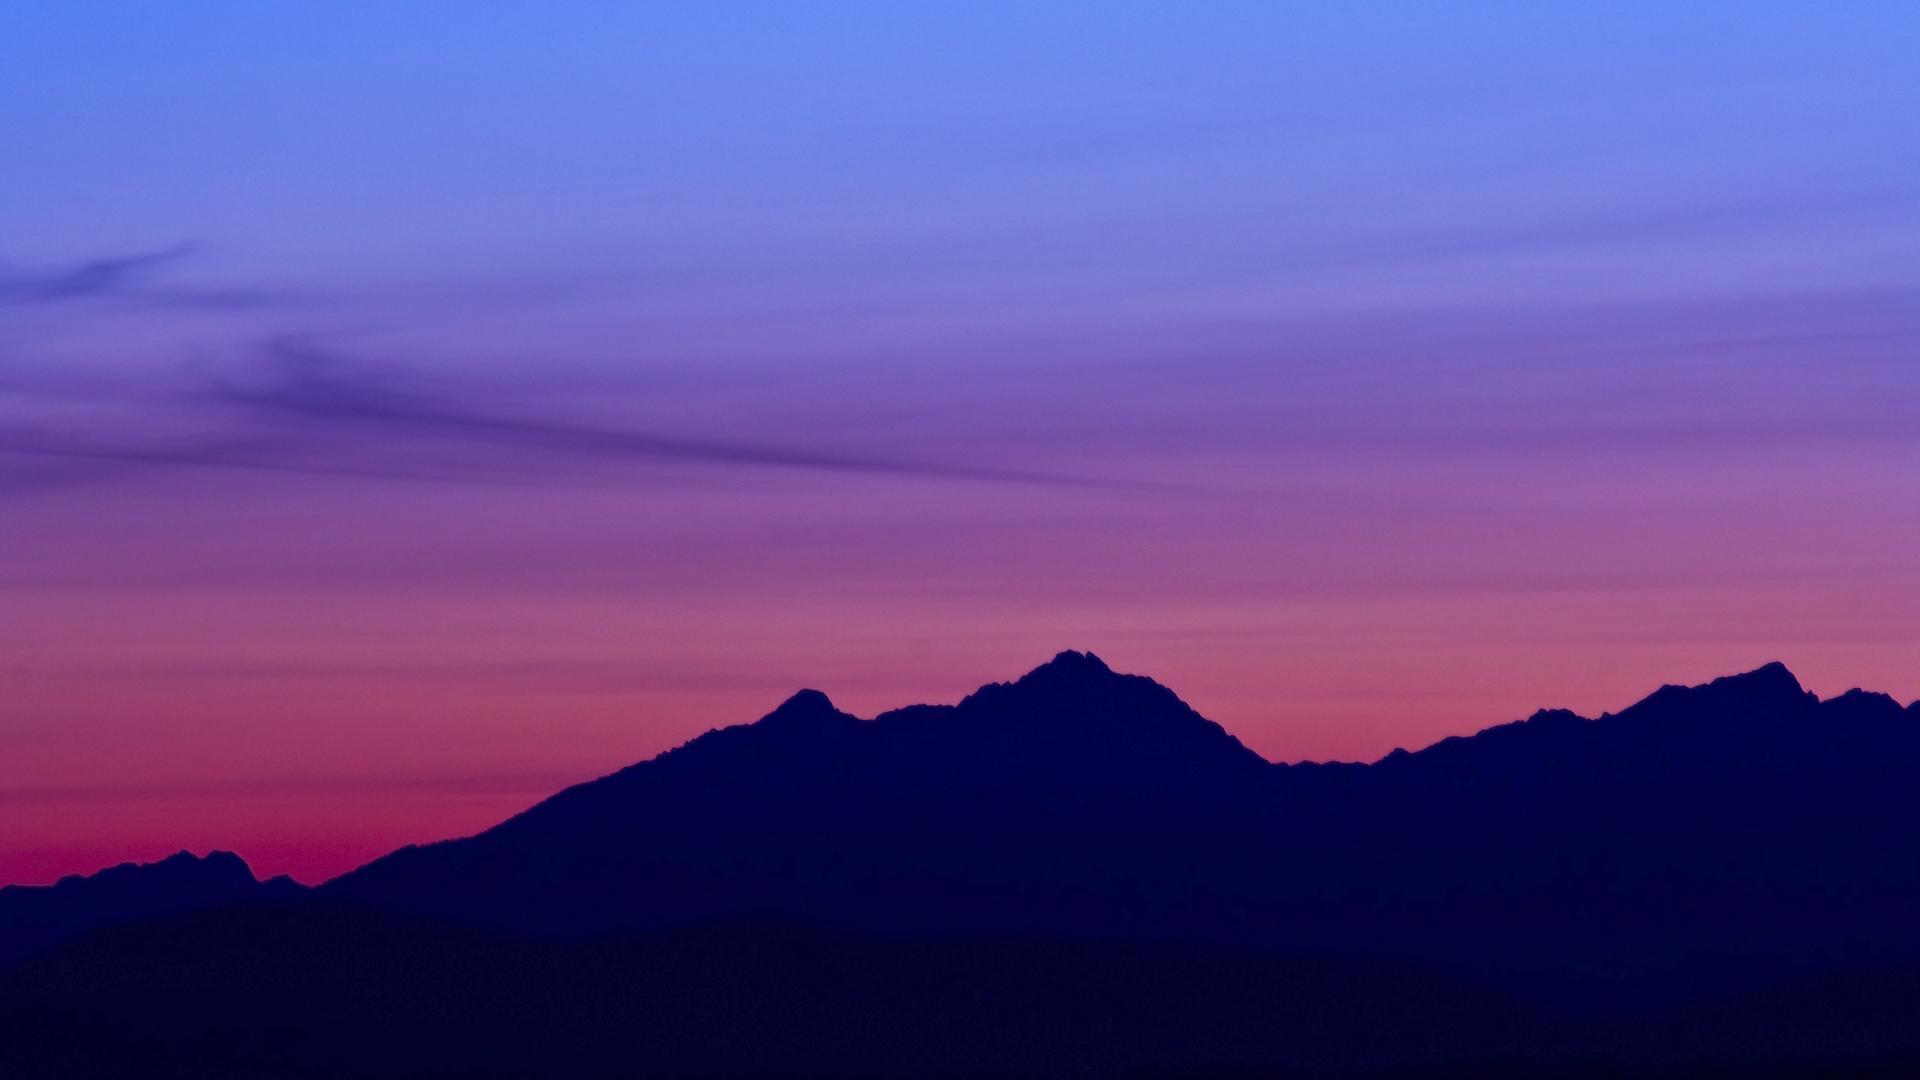 Iphone Sayings Wallpaper Earth Mountain Colors Cloud Sunrise Sunset Shade Shadow